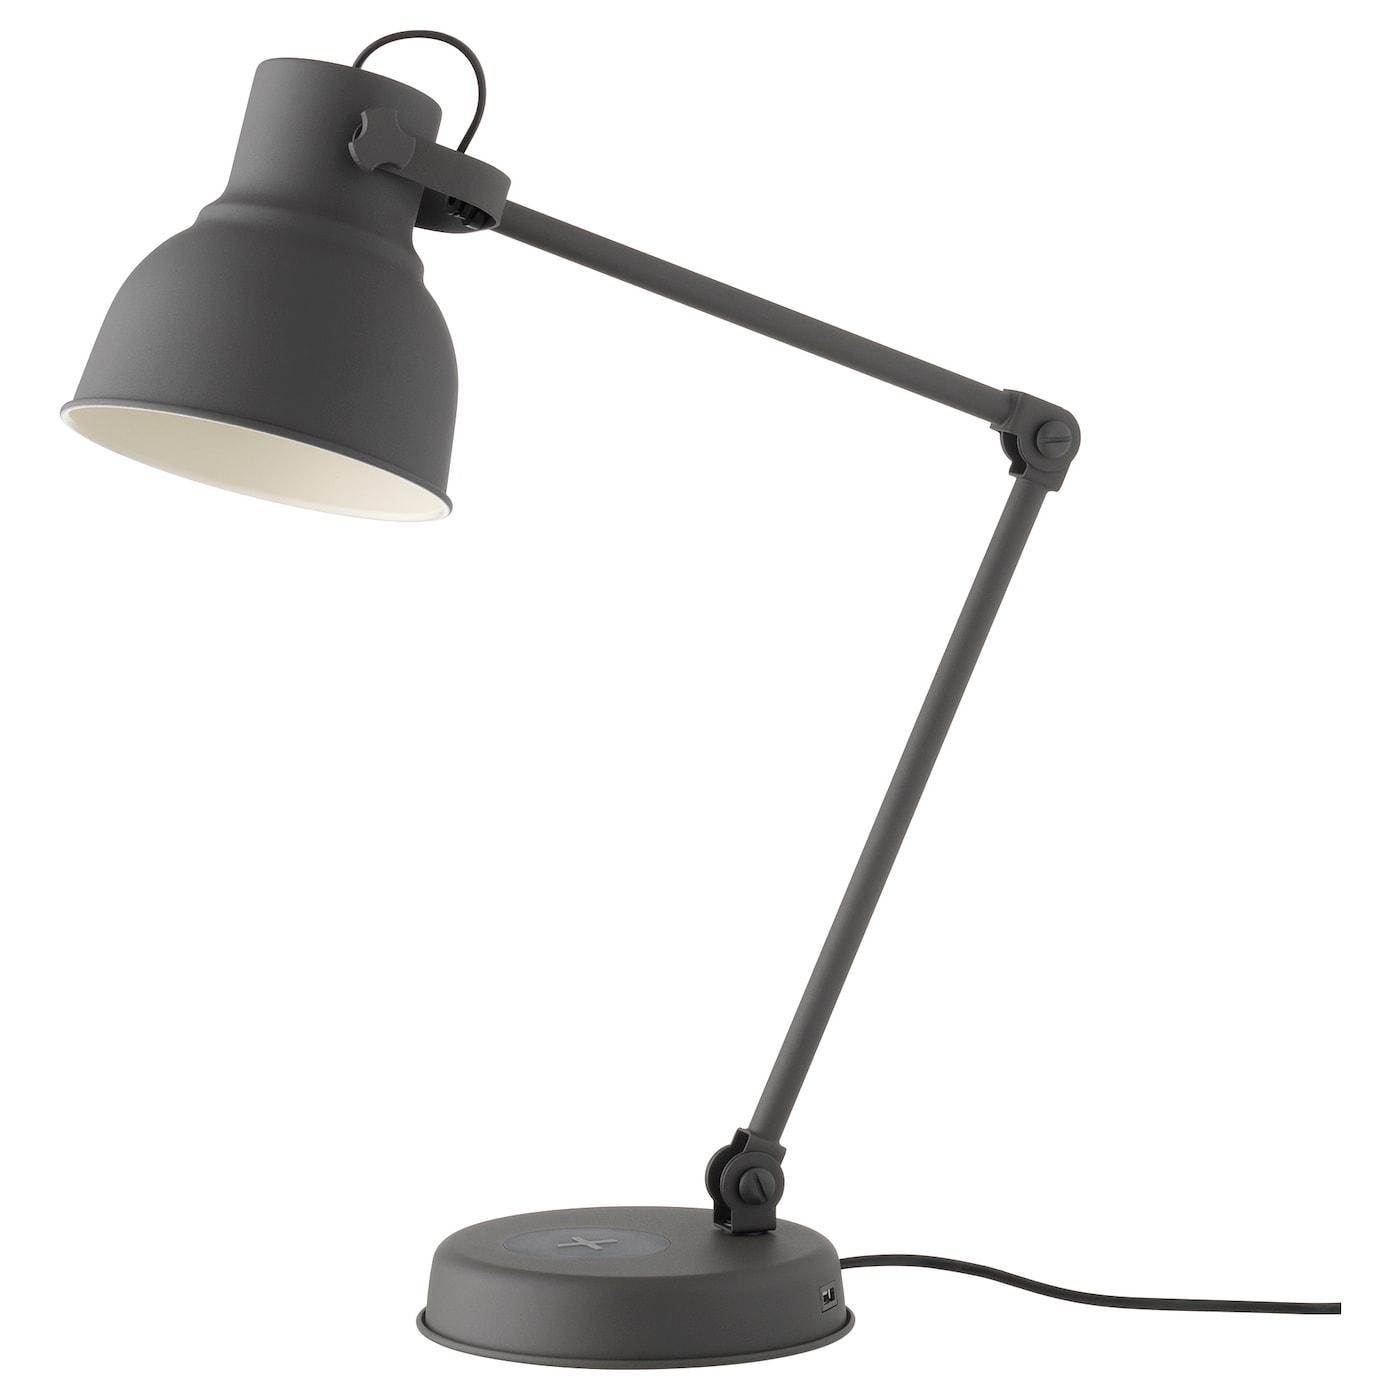 hektar flexo carga gris oscuro ikea. Black Bedroom Furniture Sets. Home Design Ideas